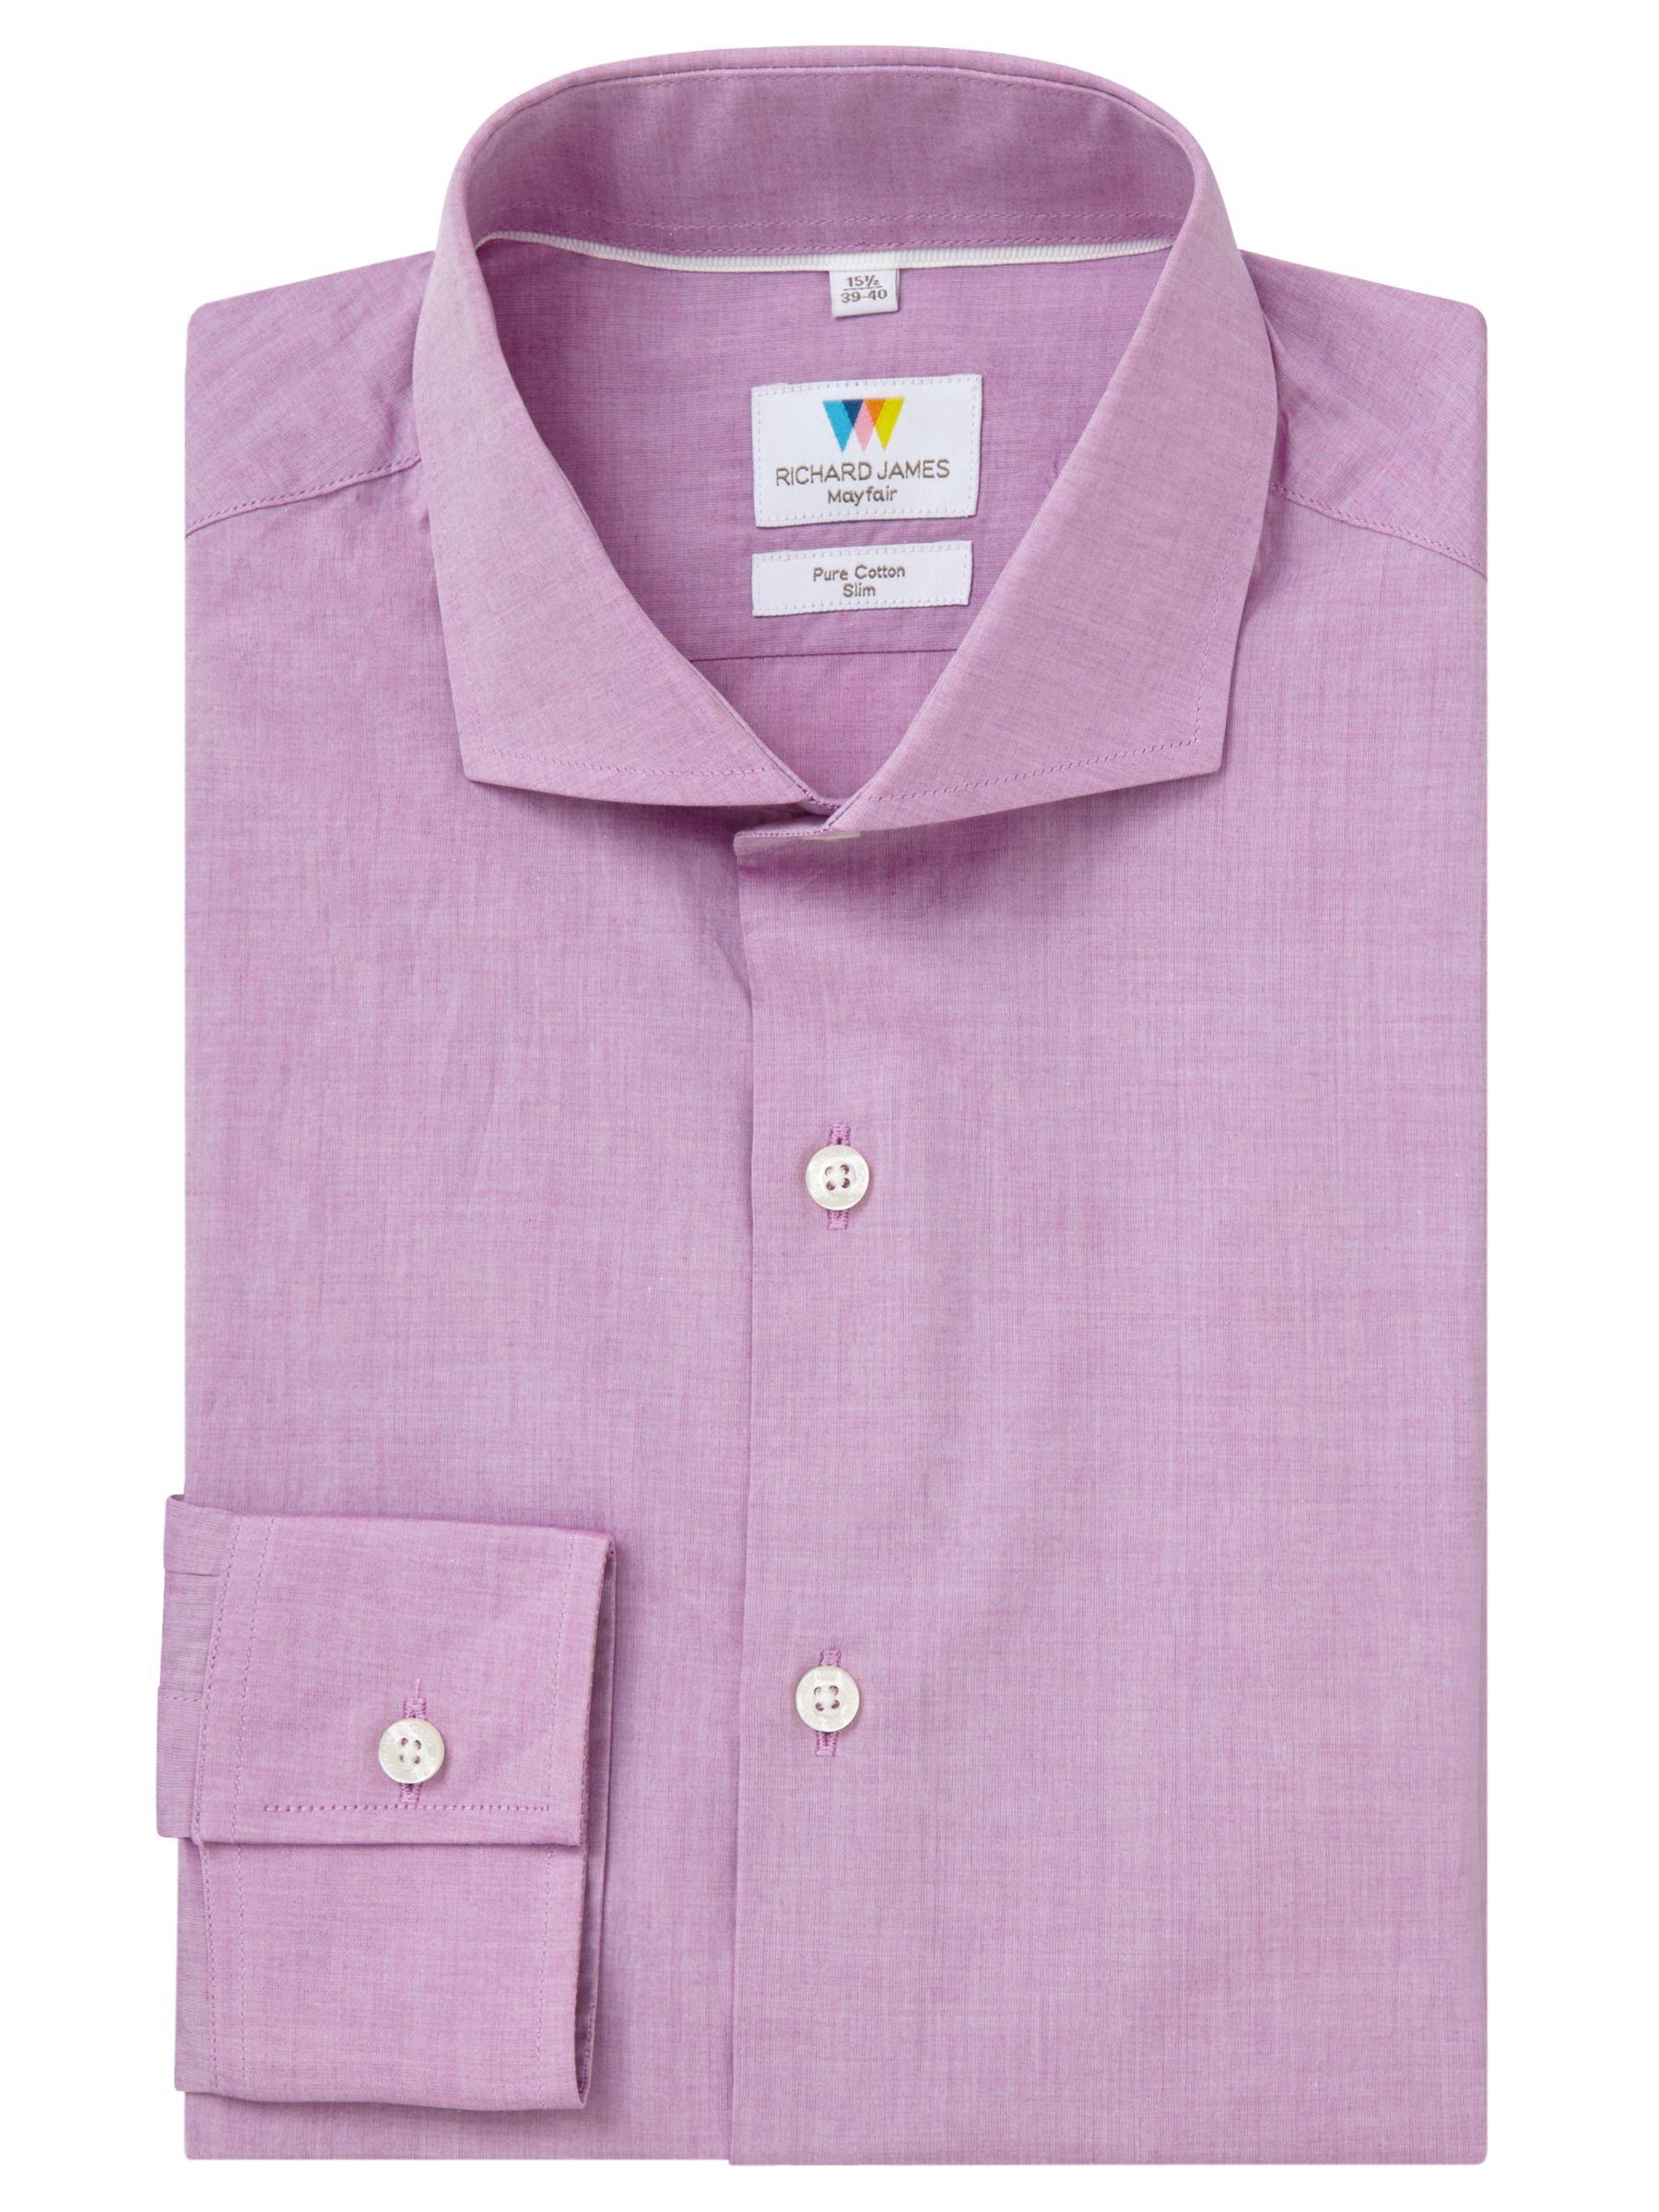 Richard James Mayfair Richard James Mayfair Chambray Slim Fit Shirt